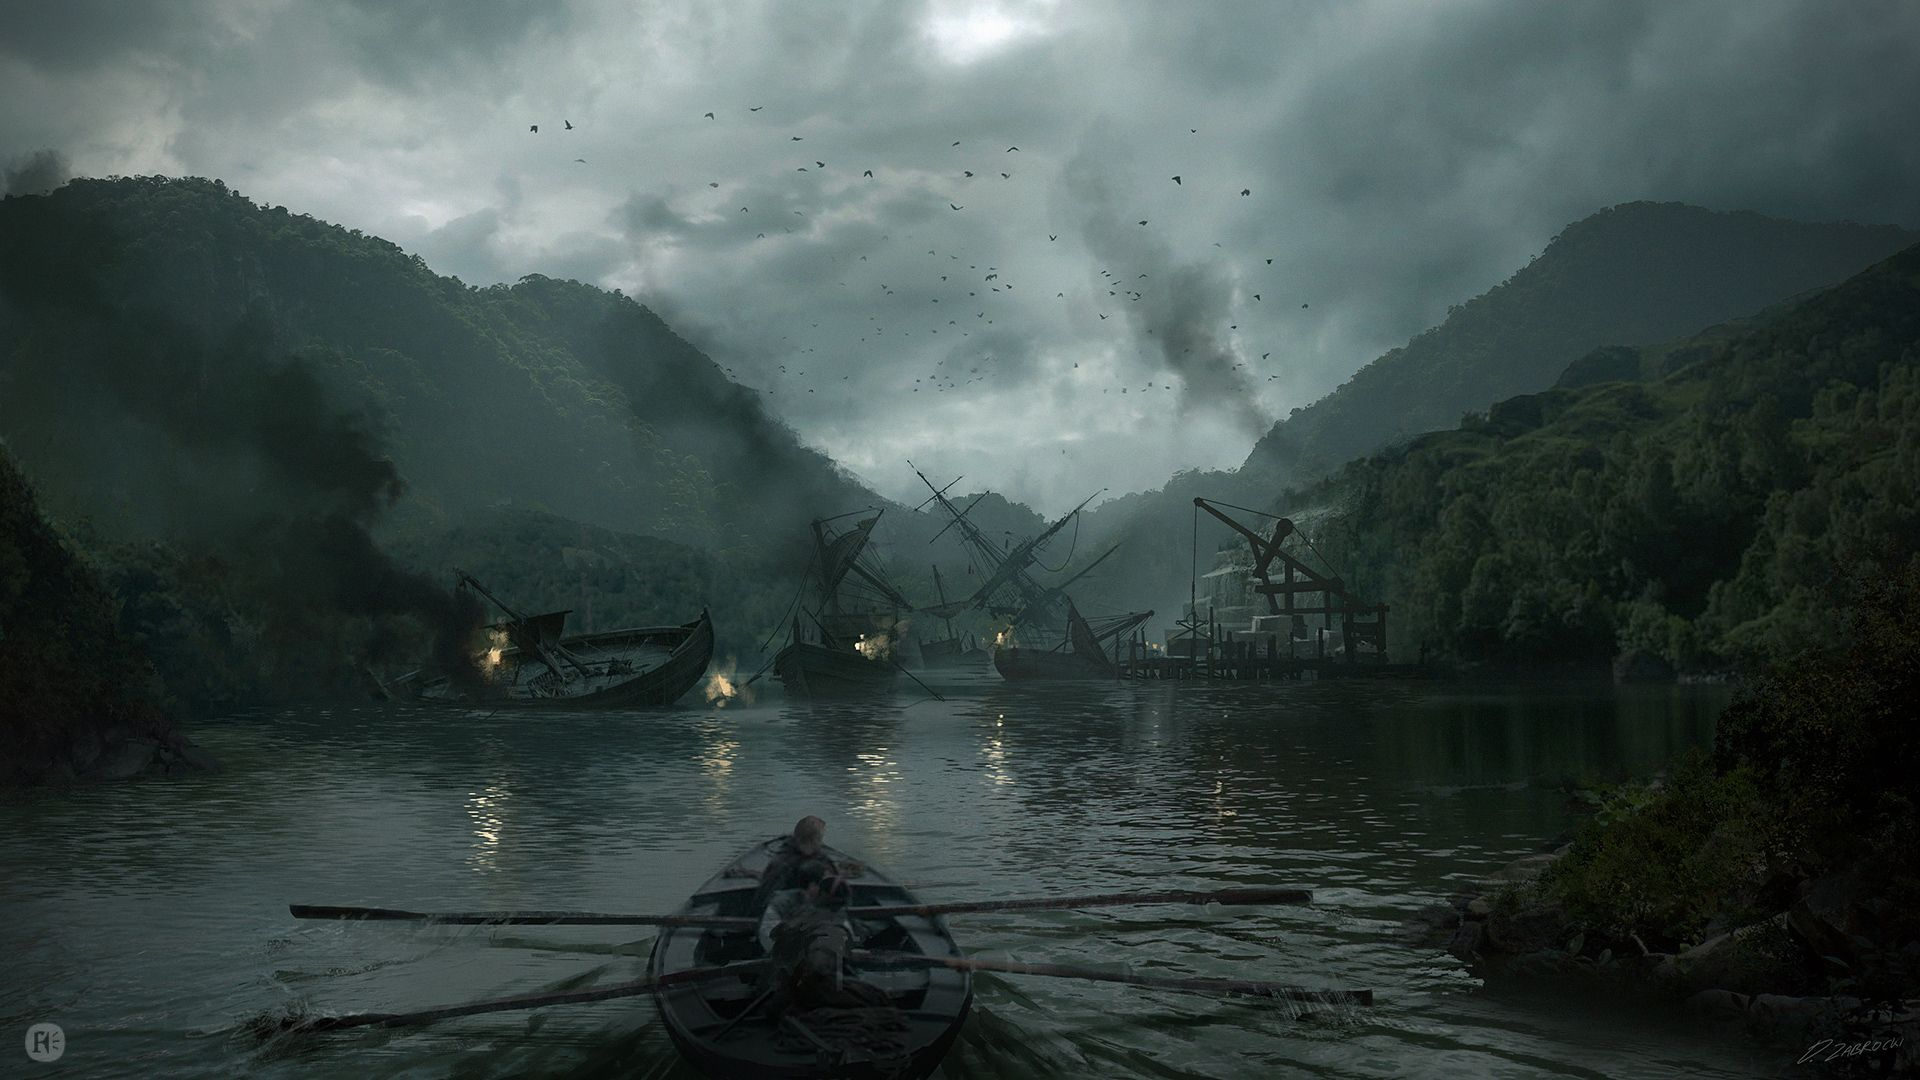 king arthur legend of the sword by daroz fantasy landscapes